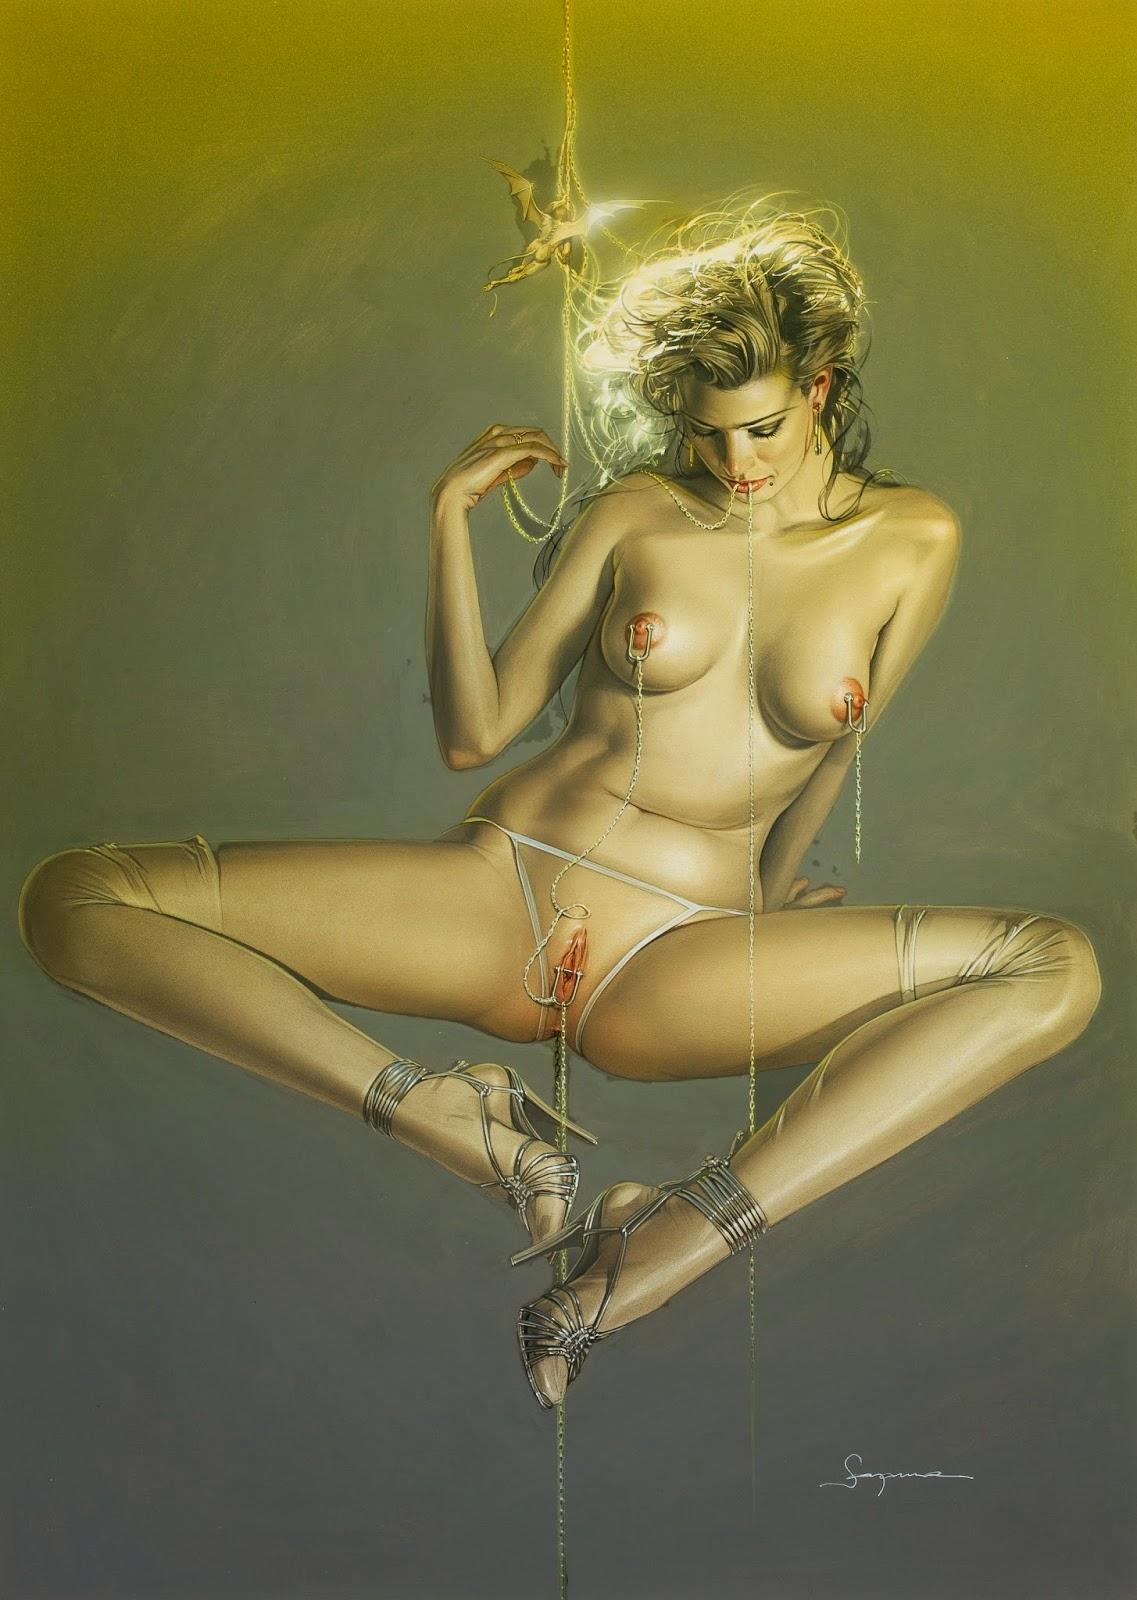 2017 11 10 erotic massage 2 4